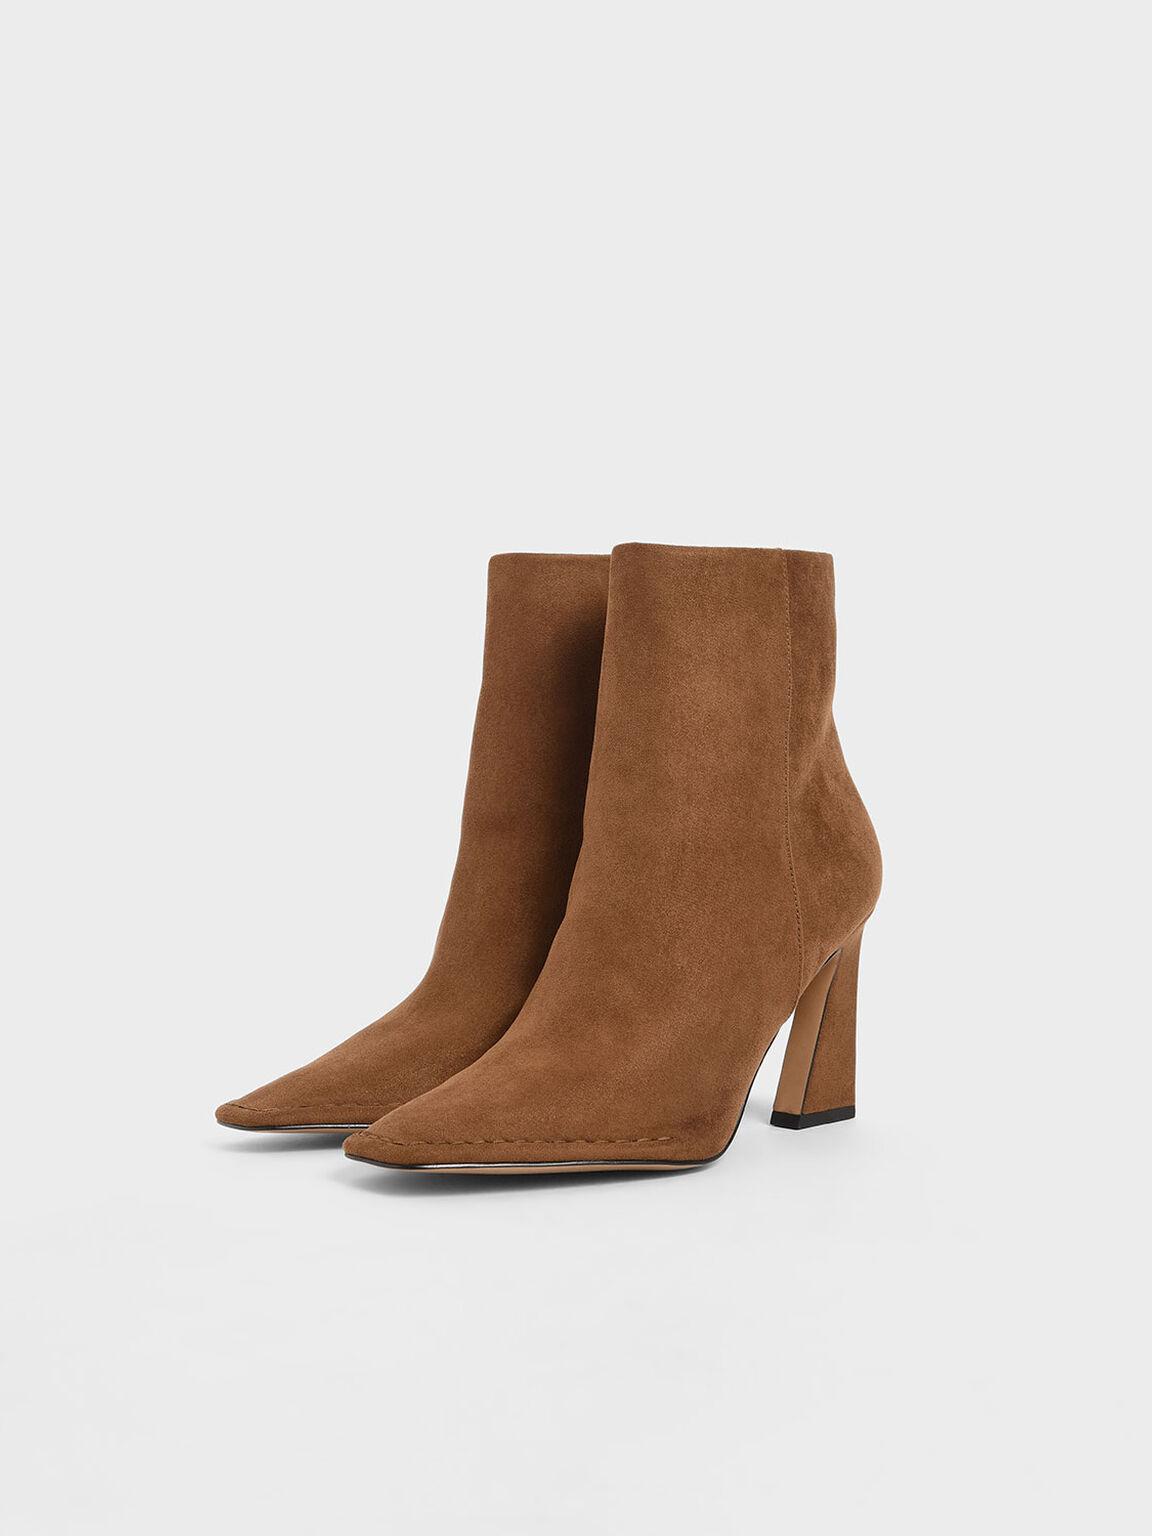 Textured Sculptural Heel Ankle Boots, Camel, hi-res